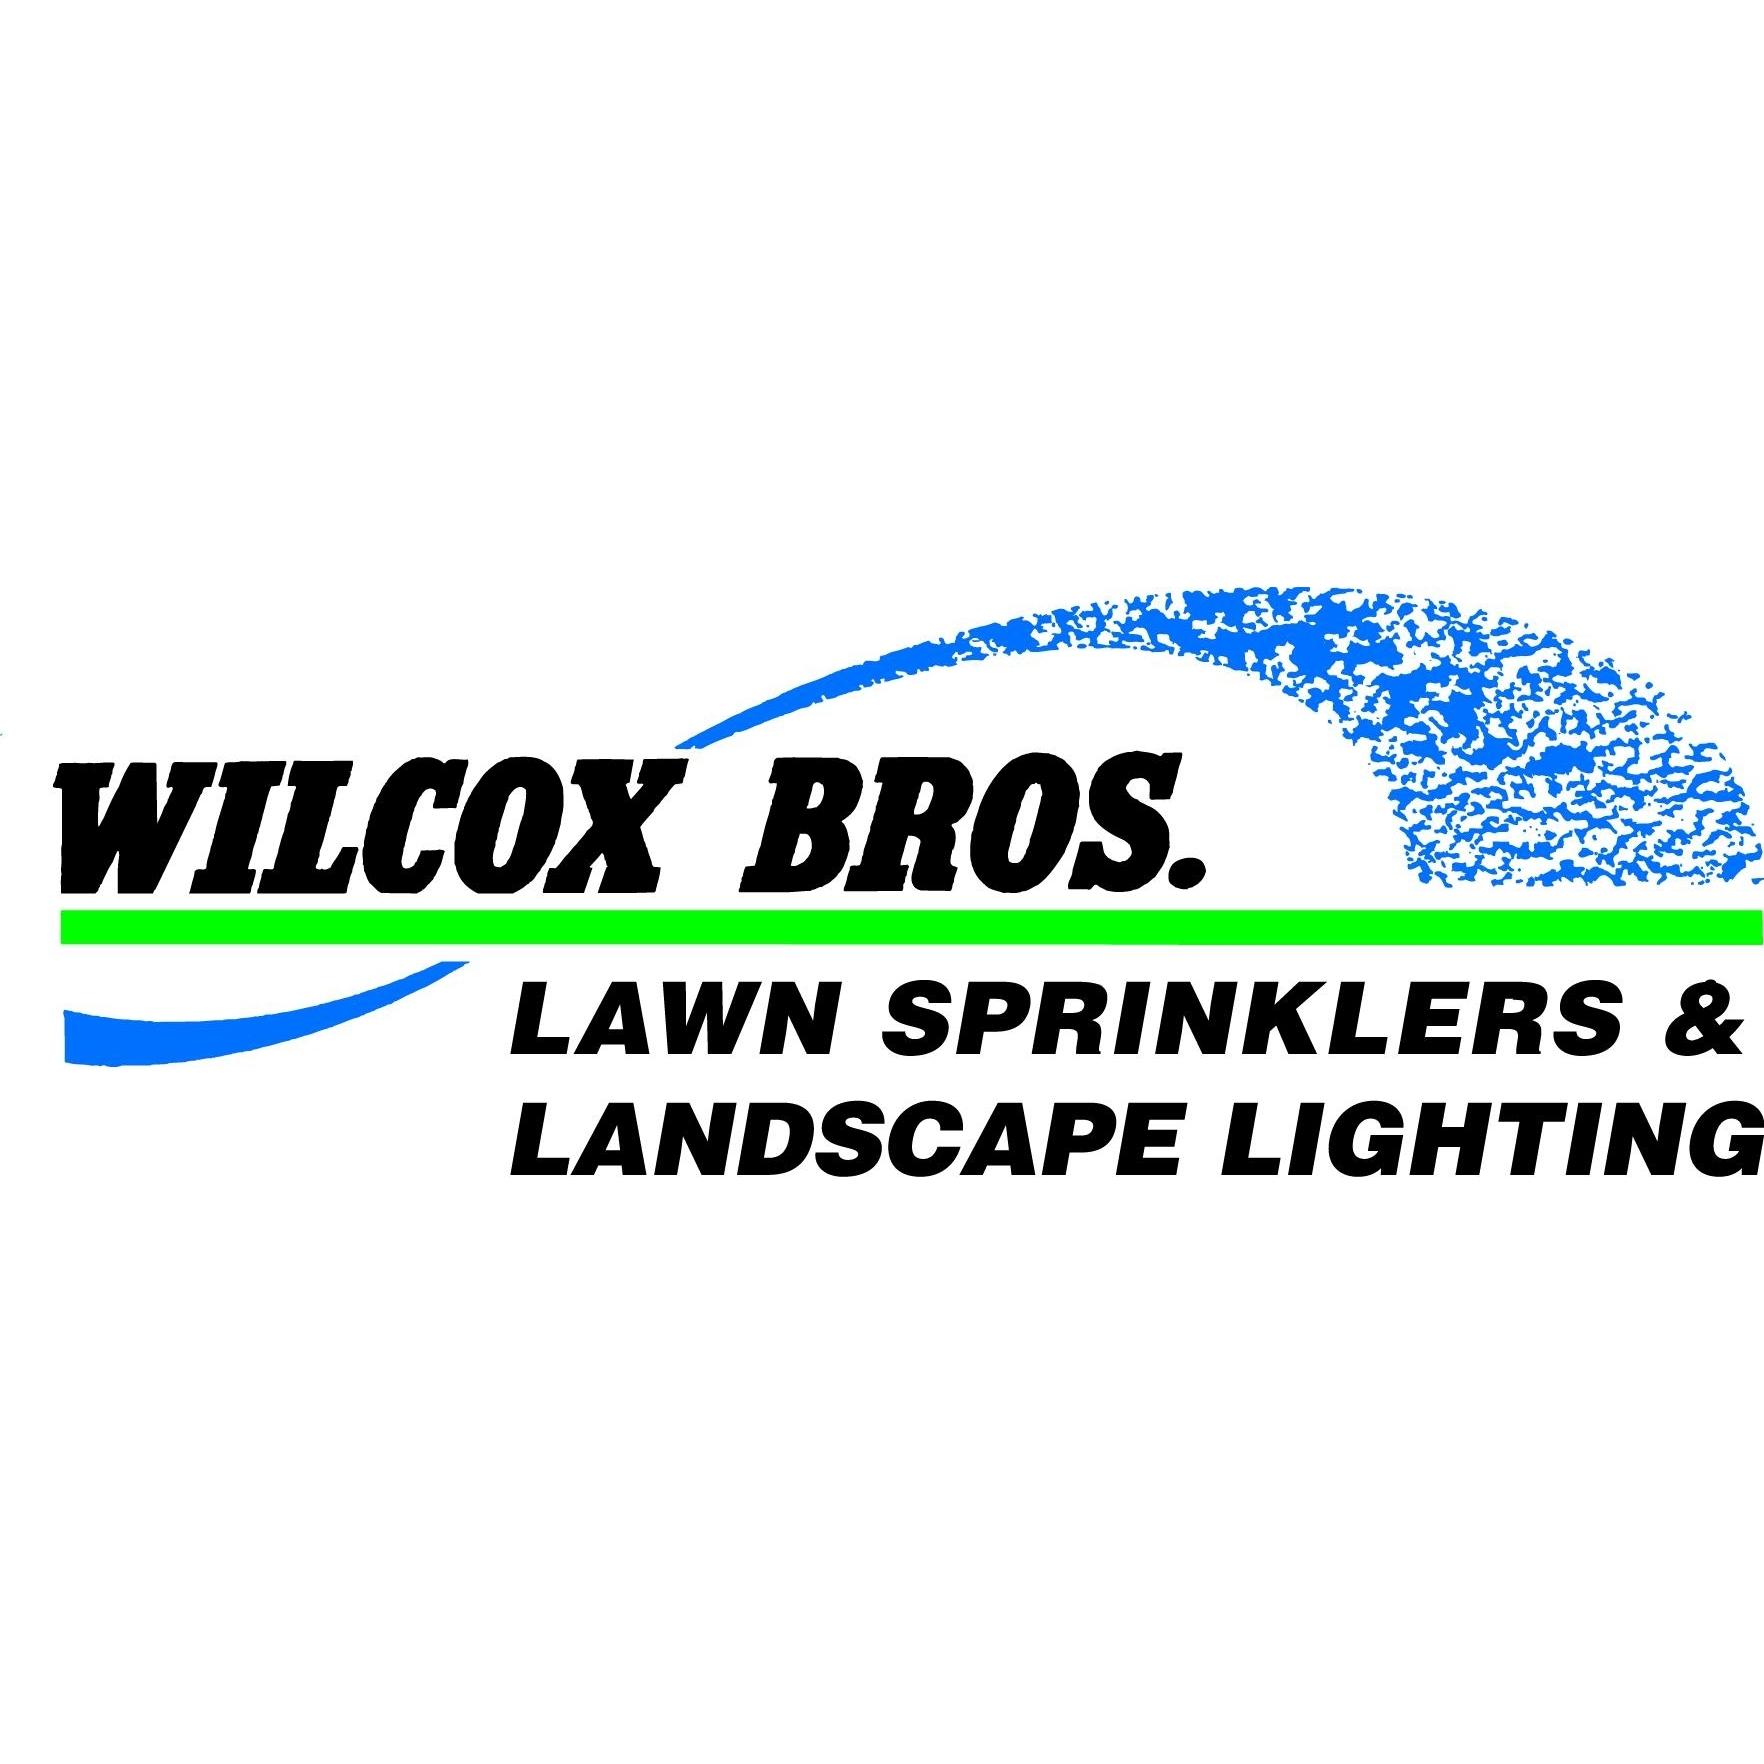 Wilcox Bros Lawn Sprinklers